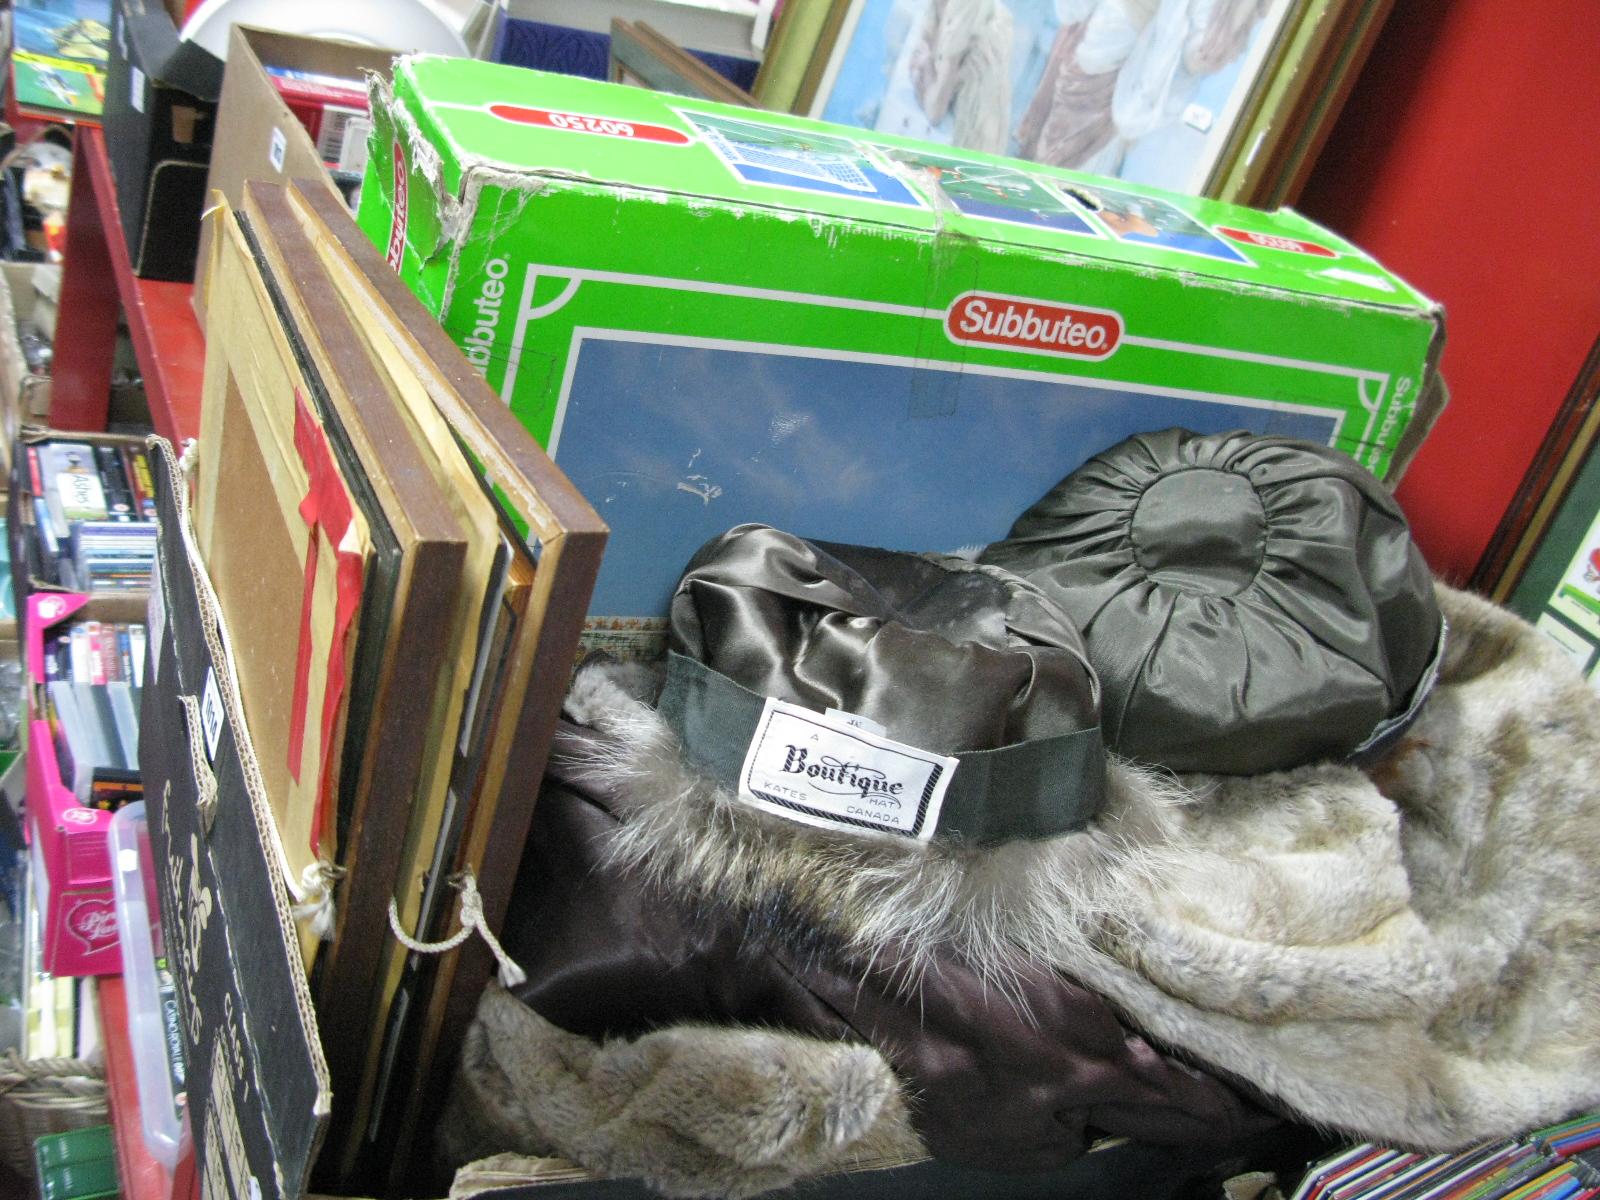 Lot 1014 - Kate's Boutique and Other Canadian Fur Hats, plus coat, Subbuteo boxed set, cigarette cards, etc:-